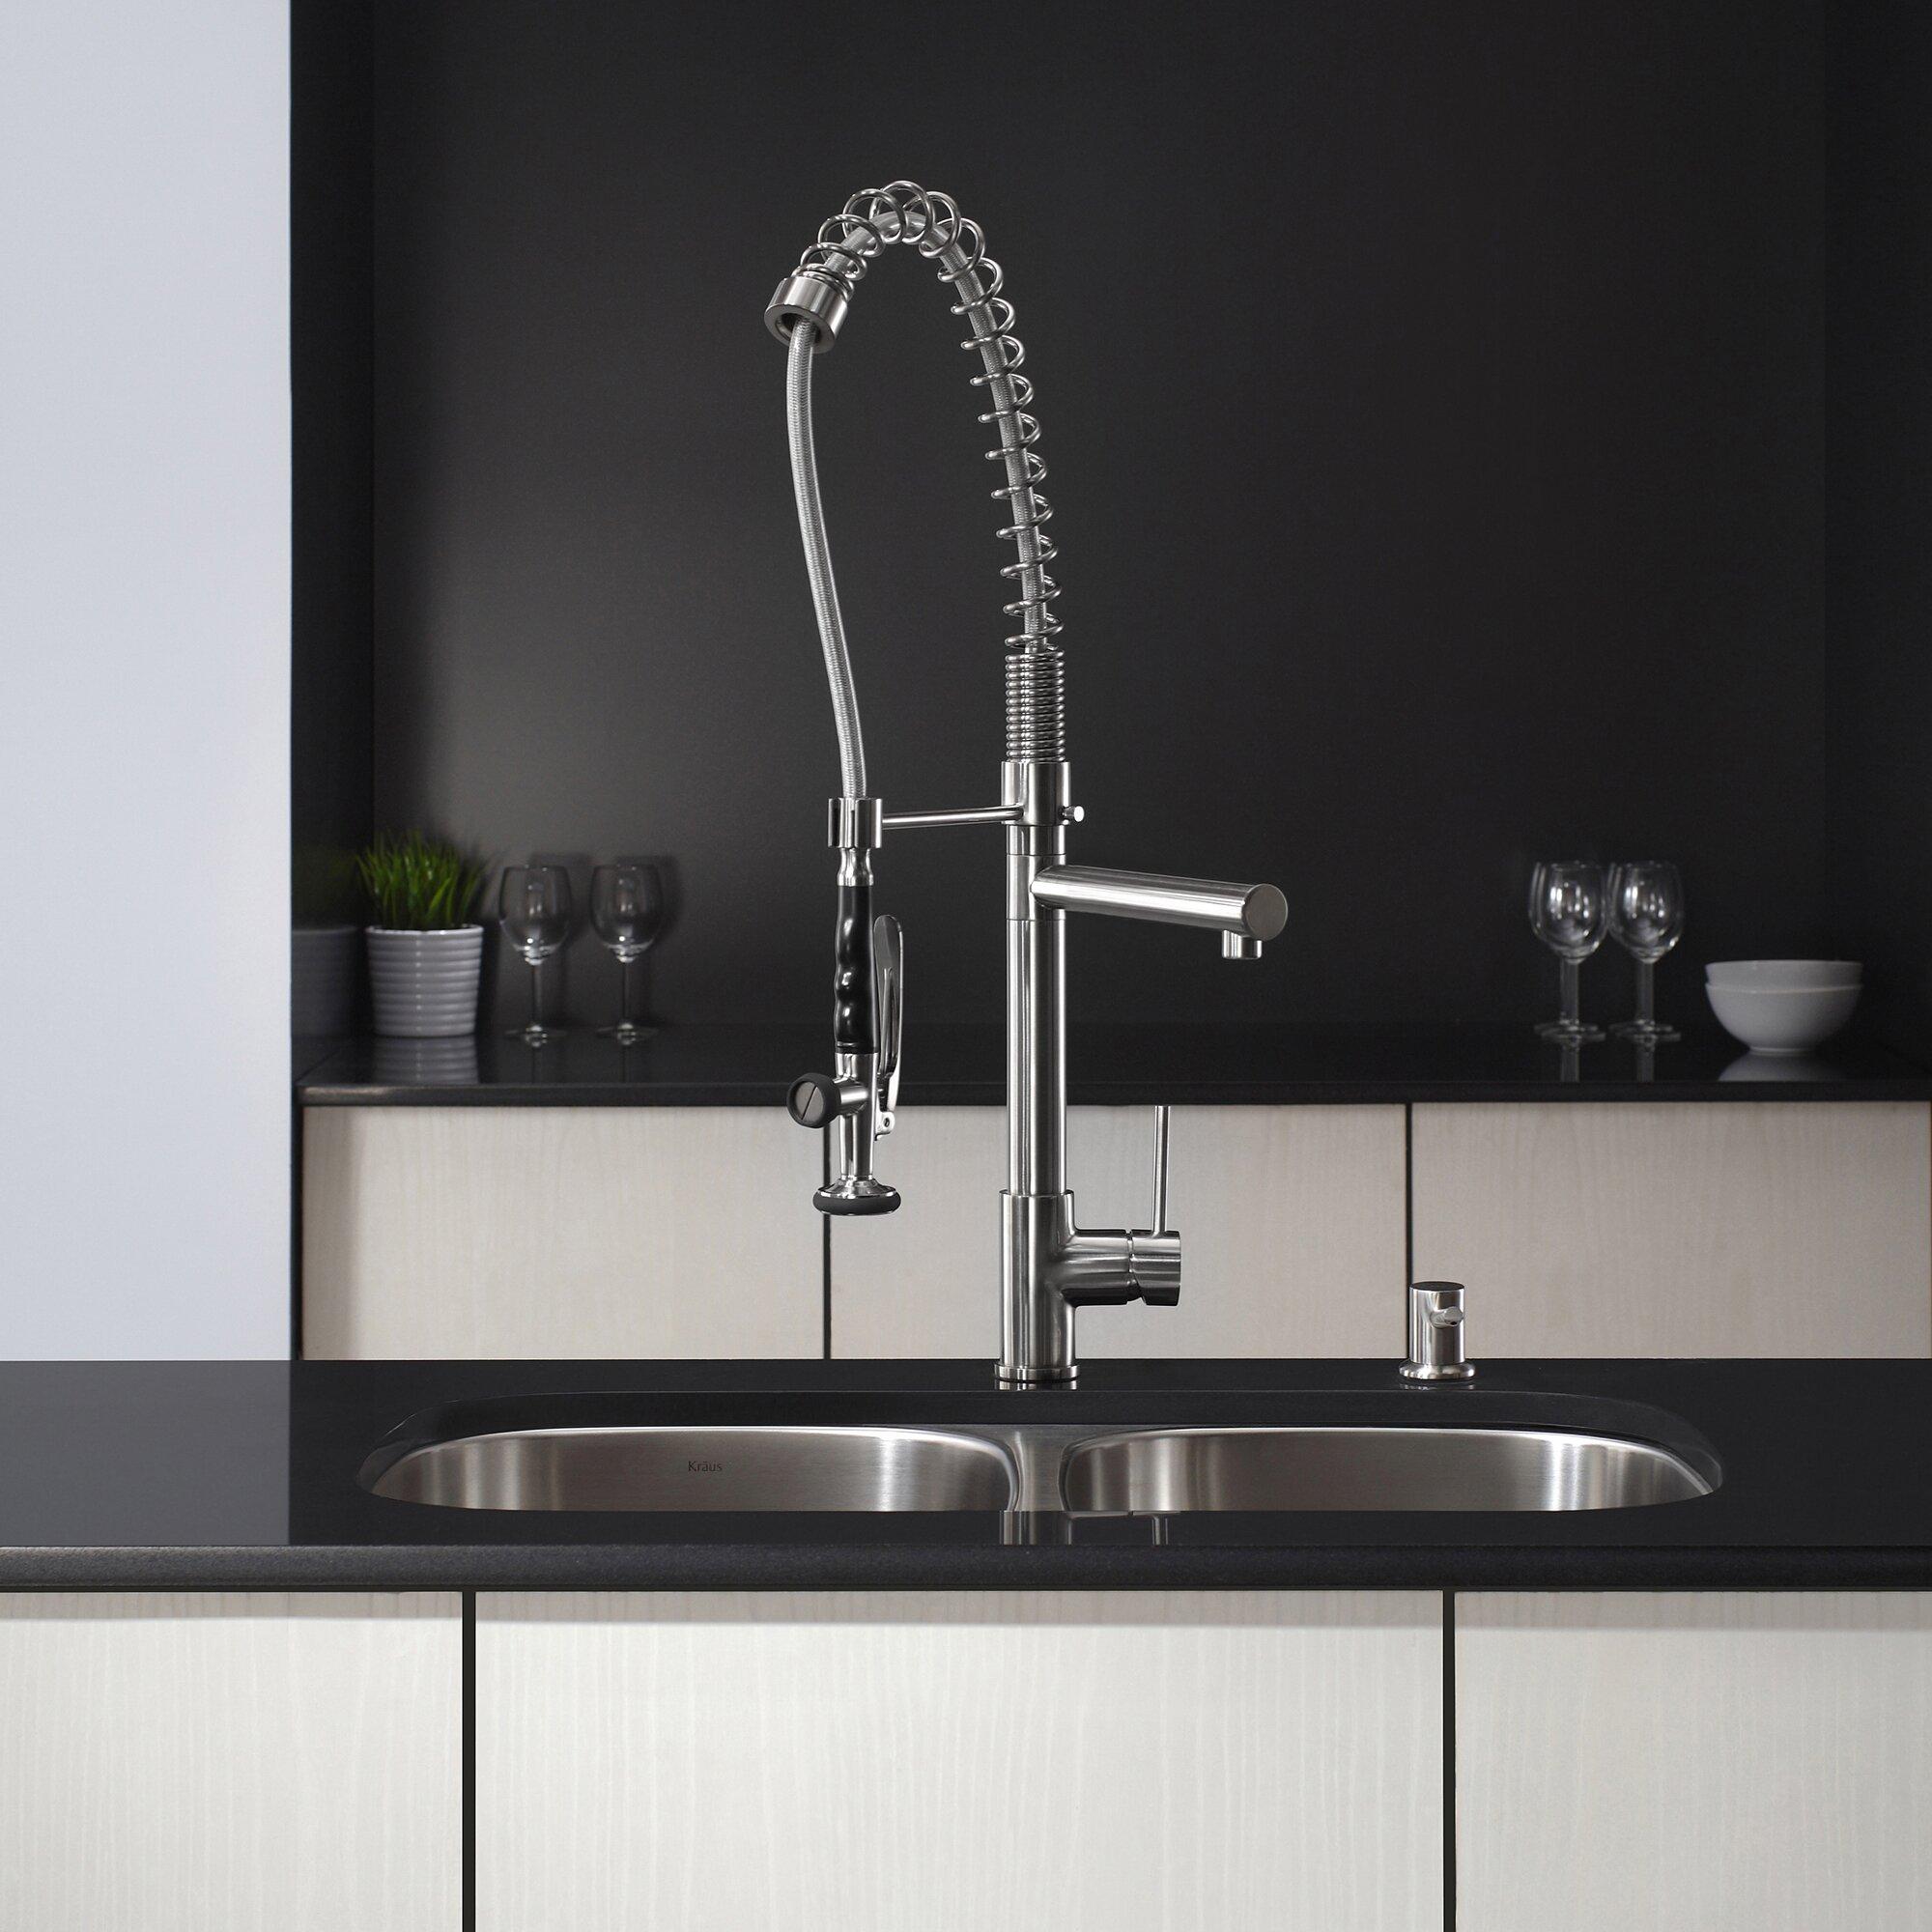 Kitchen Sink Faucet Pull Out Faucet Mixer Valve Single: Pull Out Kitchen Mixer Deck-Mounted Single Handle Faucet